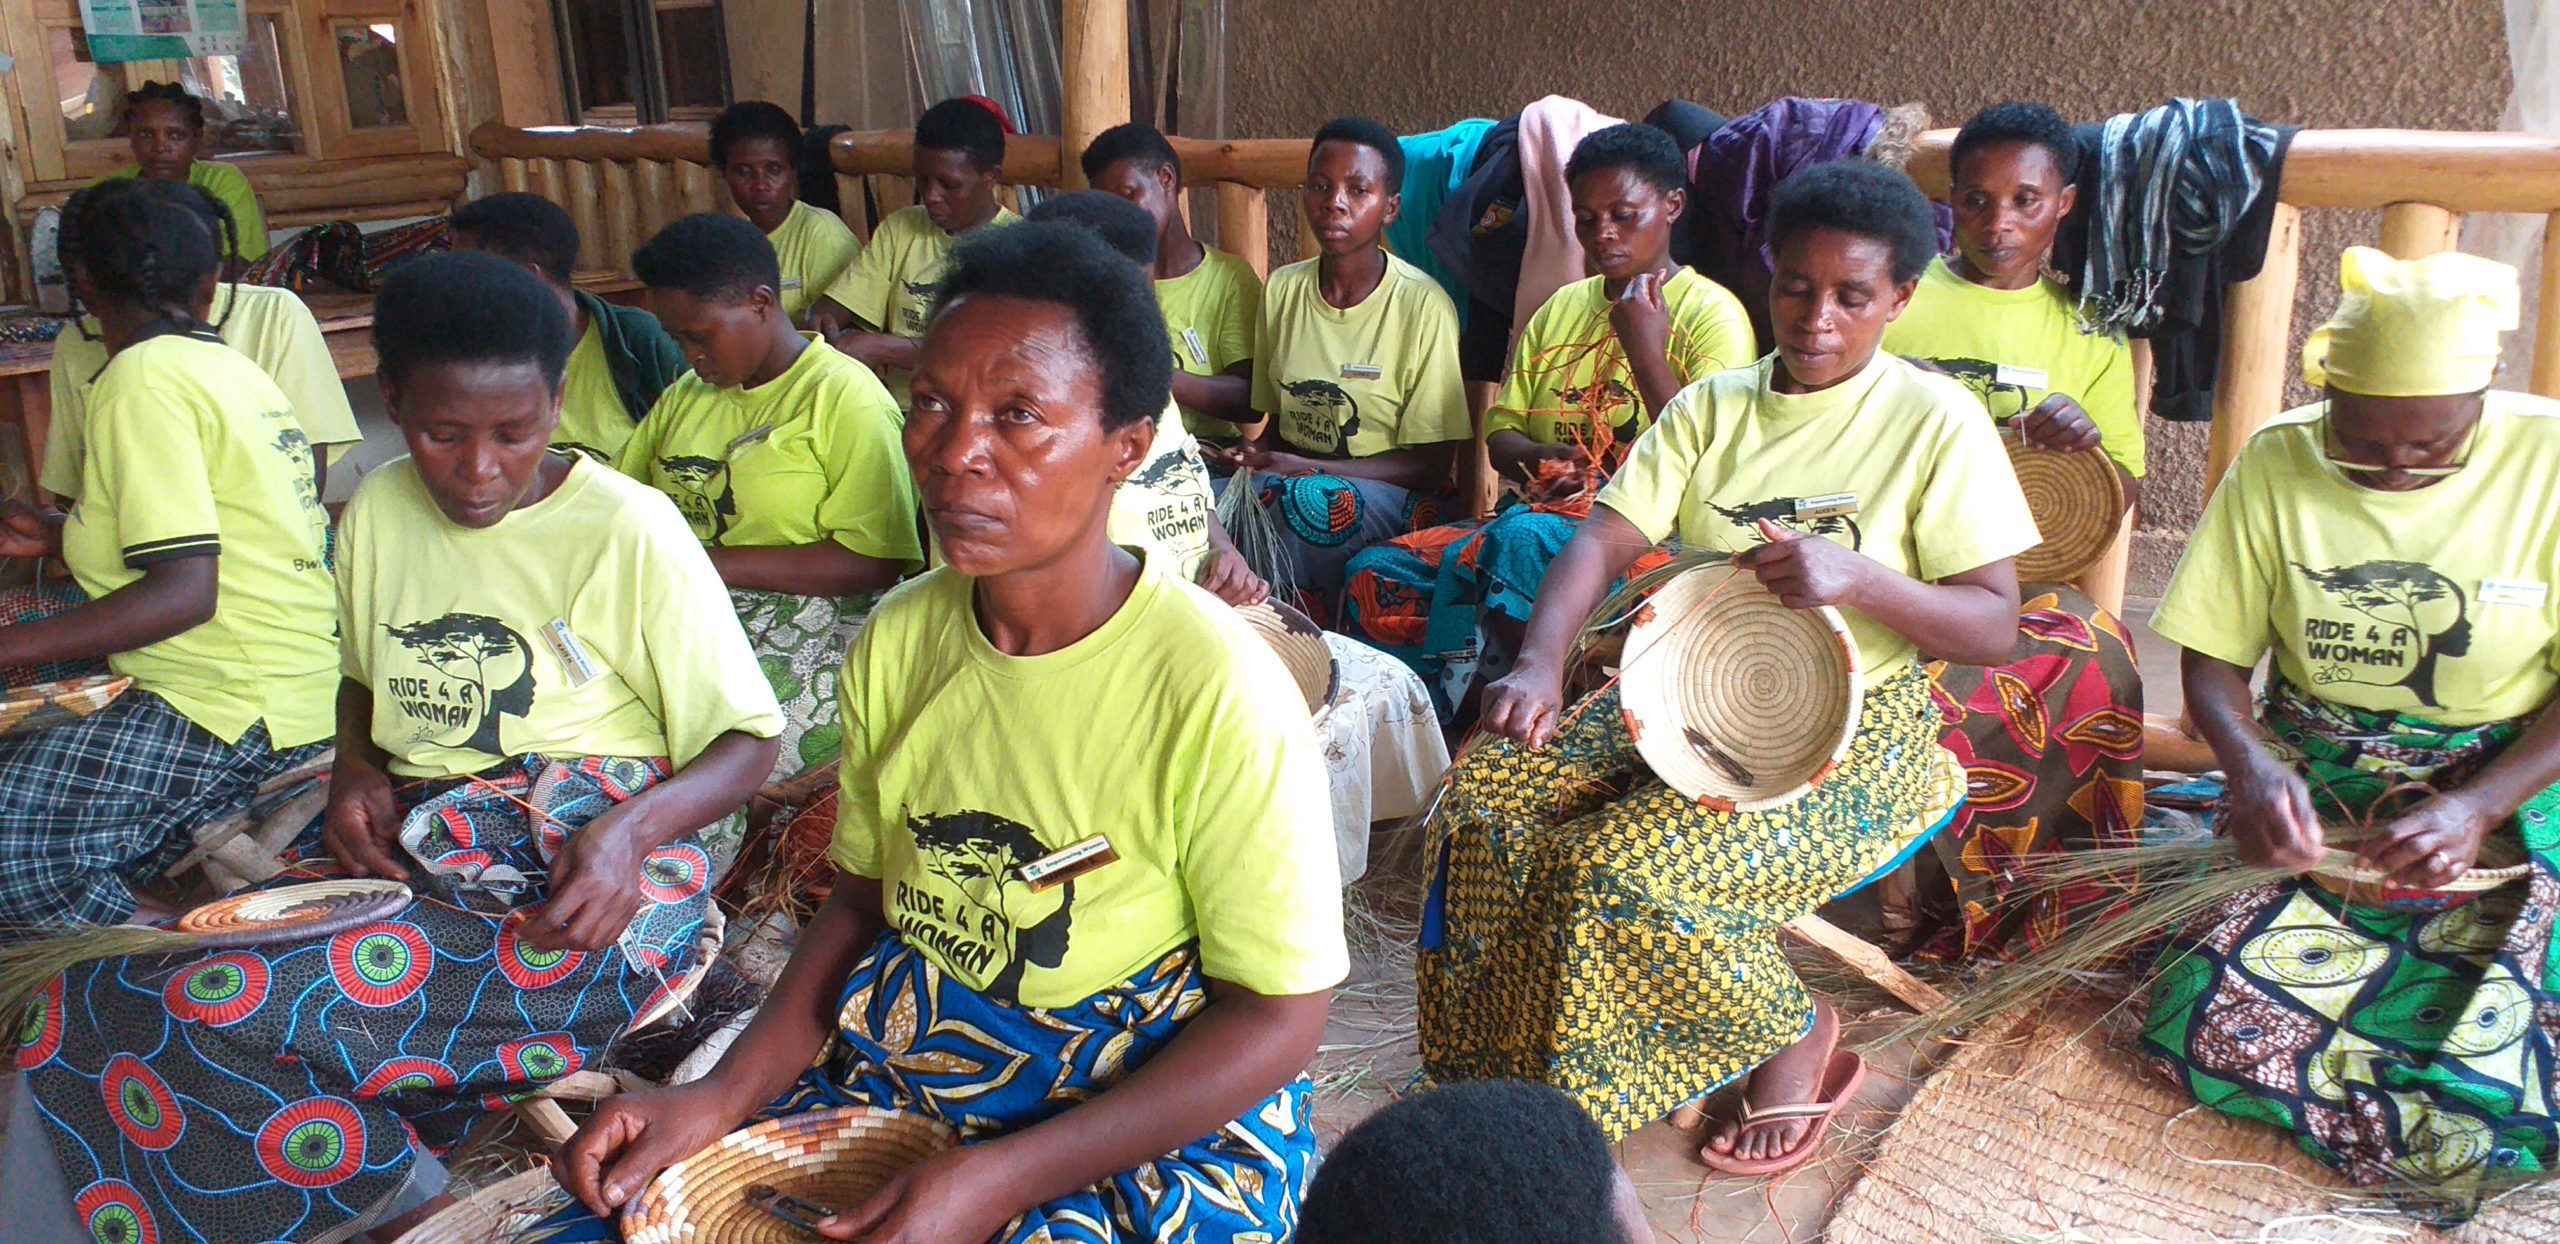 Ride 4 a women community project